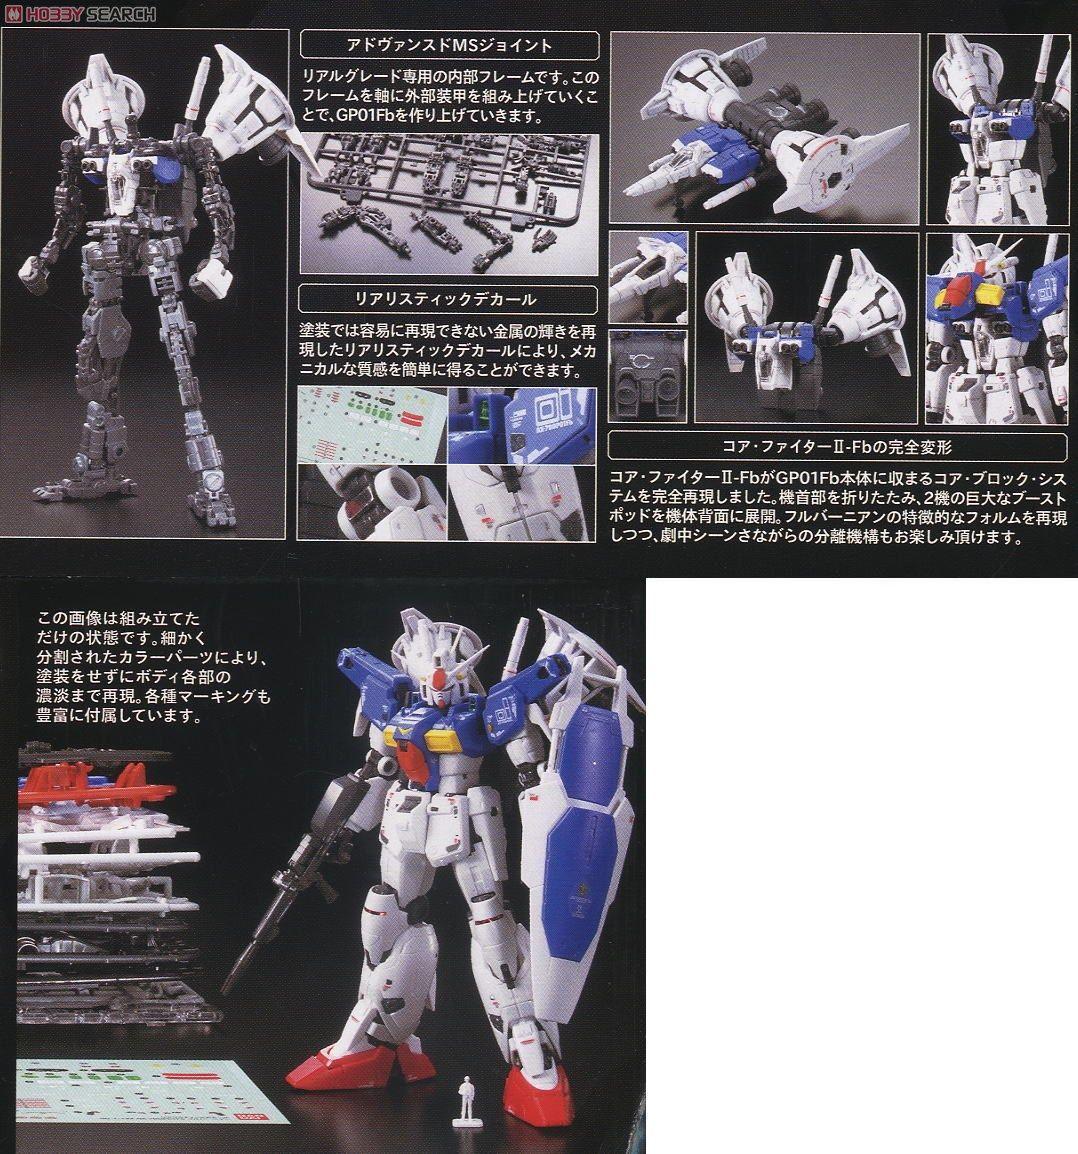 RX-78 GP01Fb Gundam GP01 Full Vernian (RG) (Gundam Model Kits) Item picture5